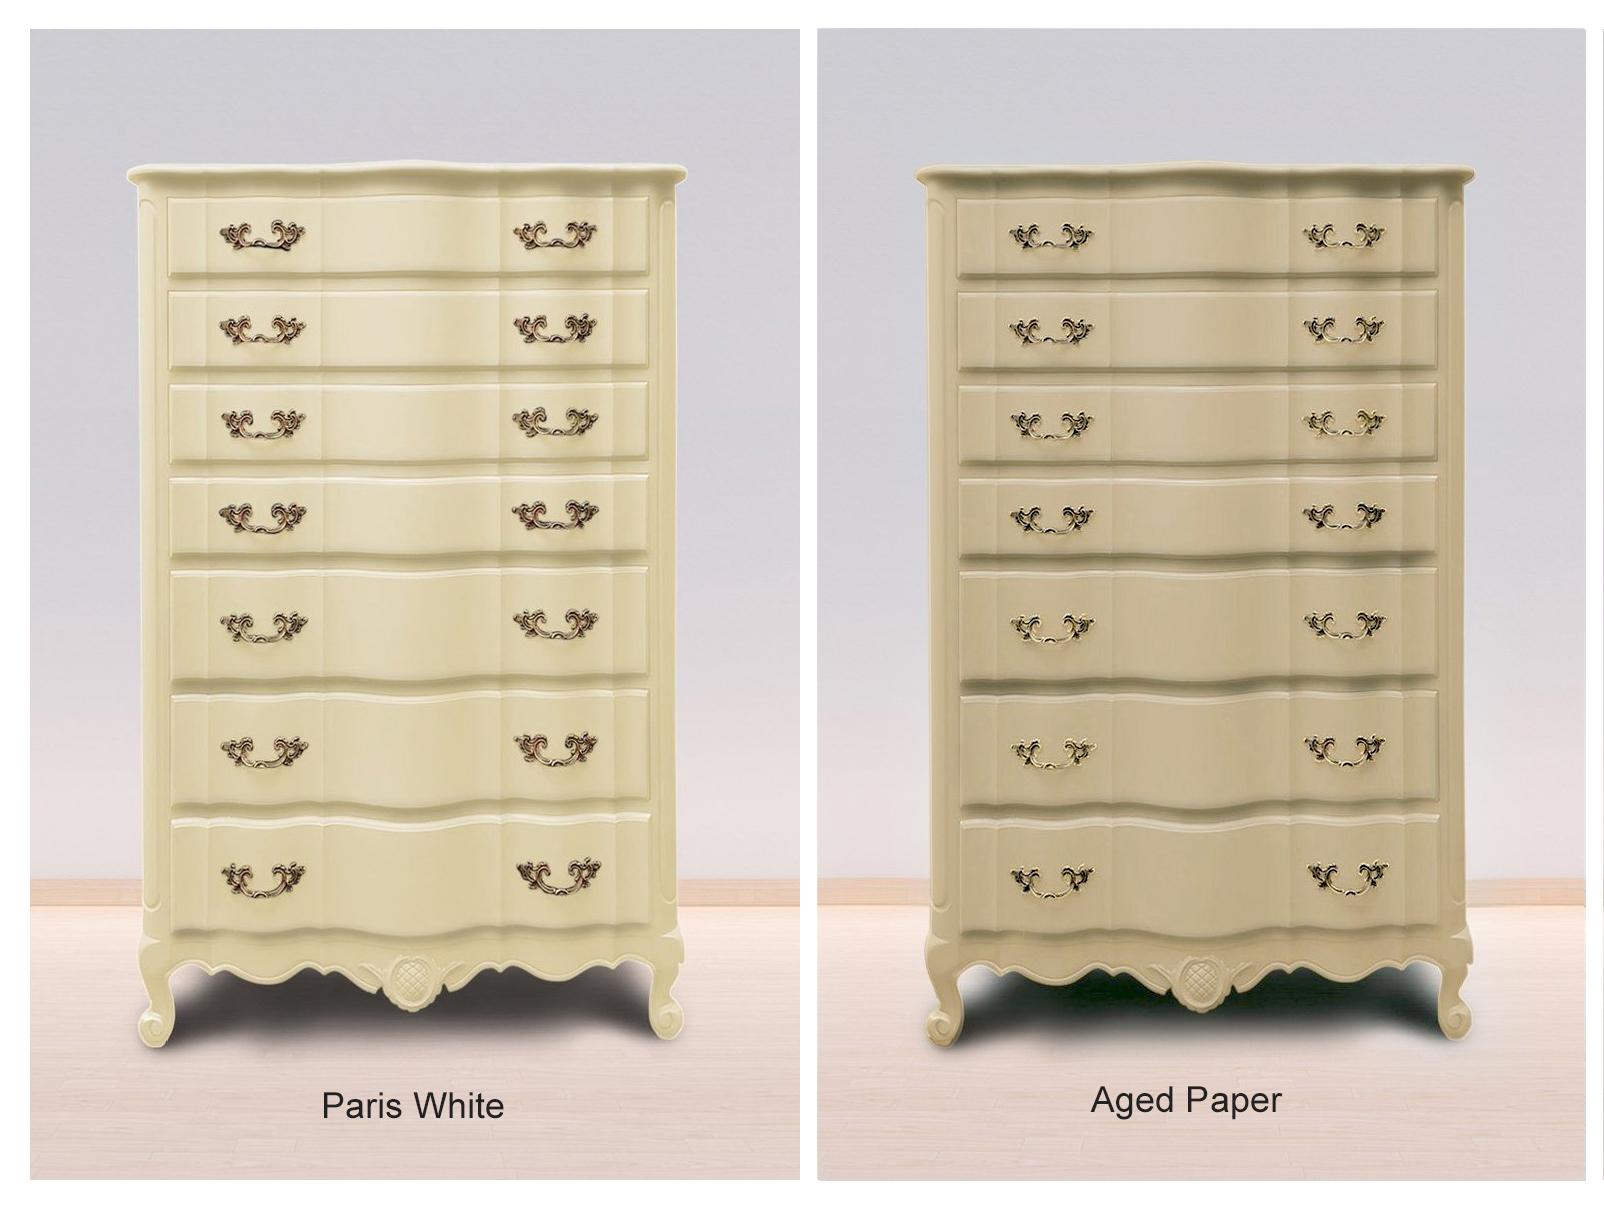 Paris White & Aged Paper